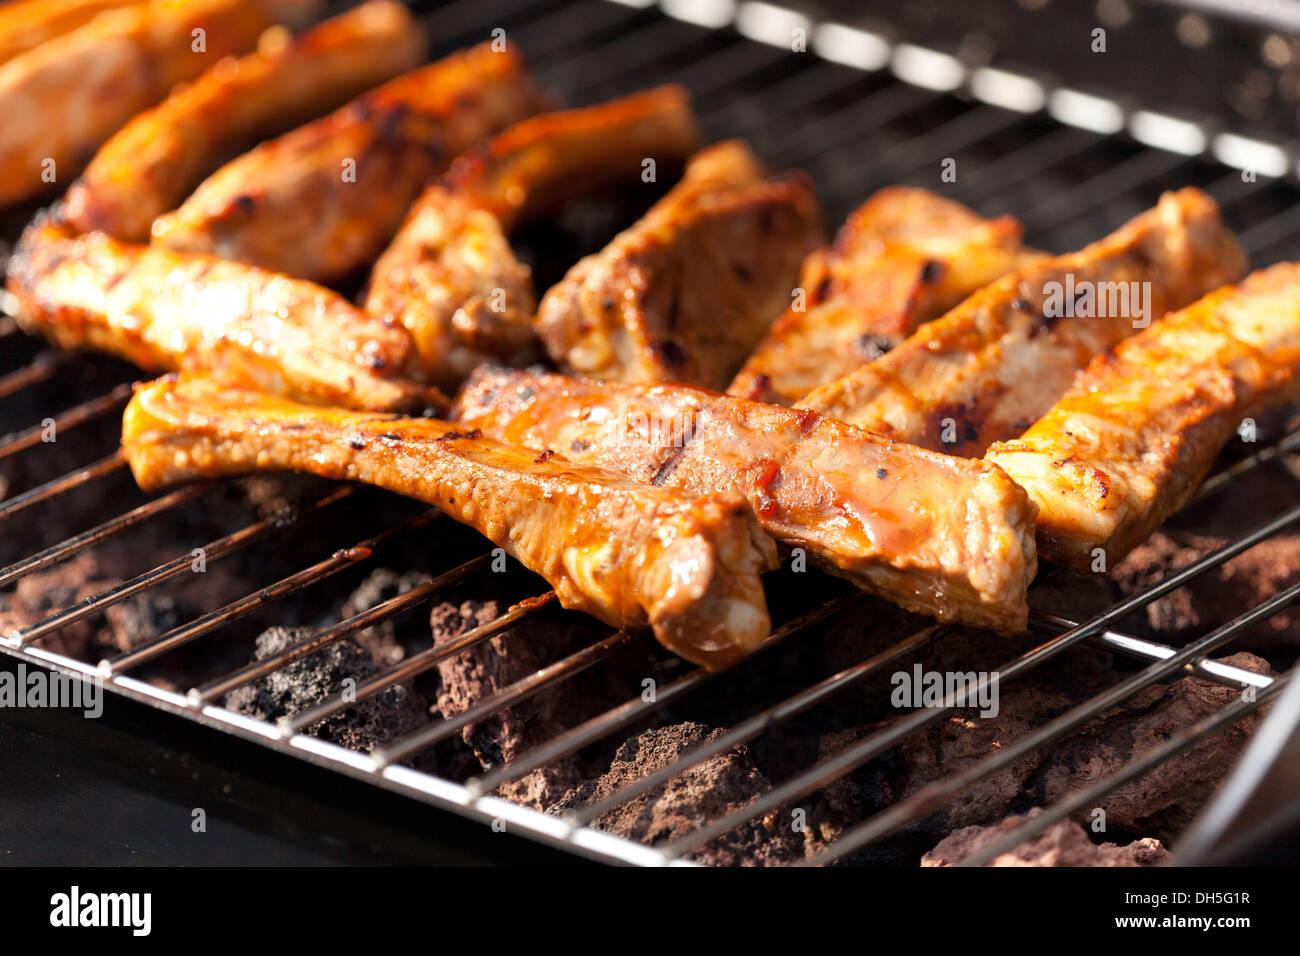 Grille Spareribs På Gasgrill : Spareribs auf grill kochen stockfoto bild  alamy